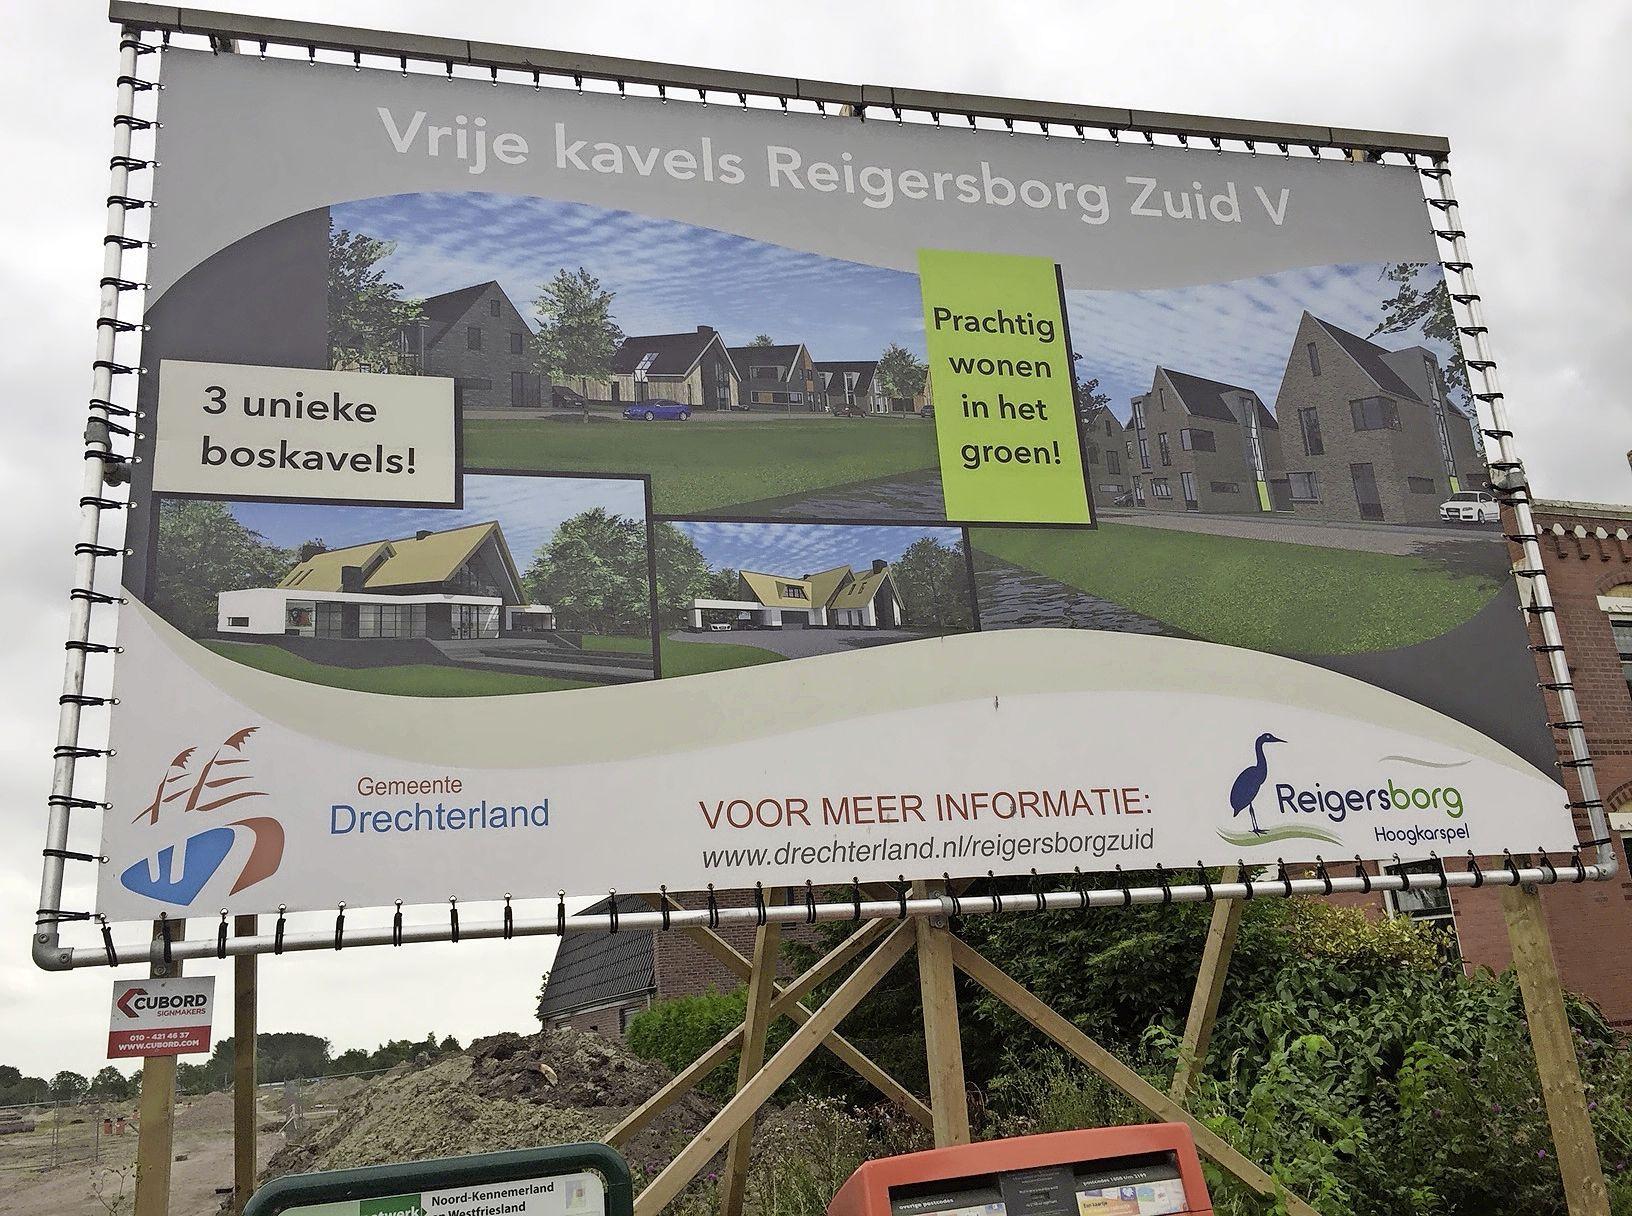 Drechterland gaat vaker controleren op illegaal wonen